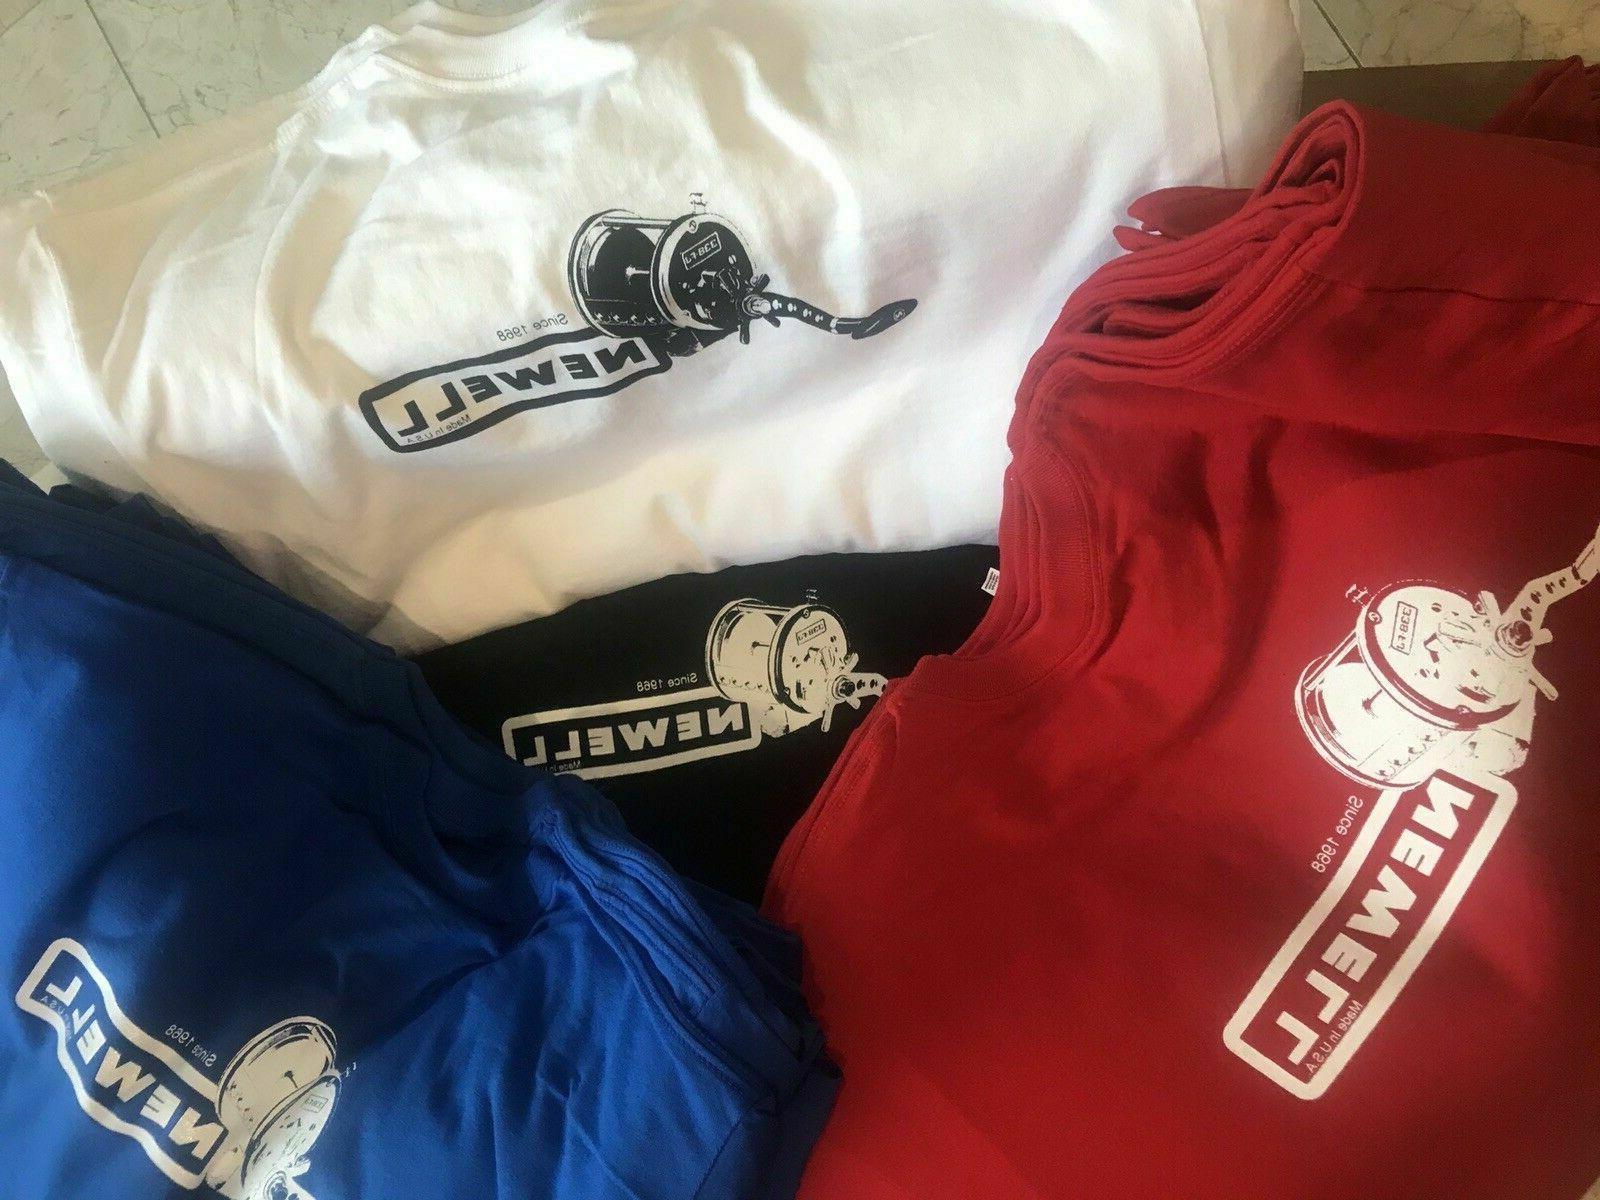 Newell Reels Shirt On Design- sizes L oldschool